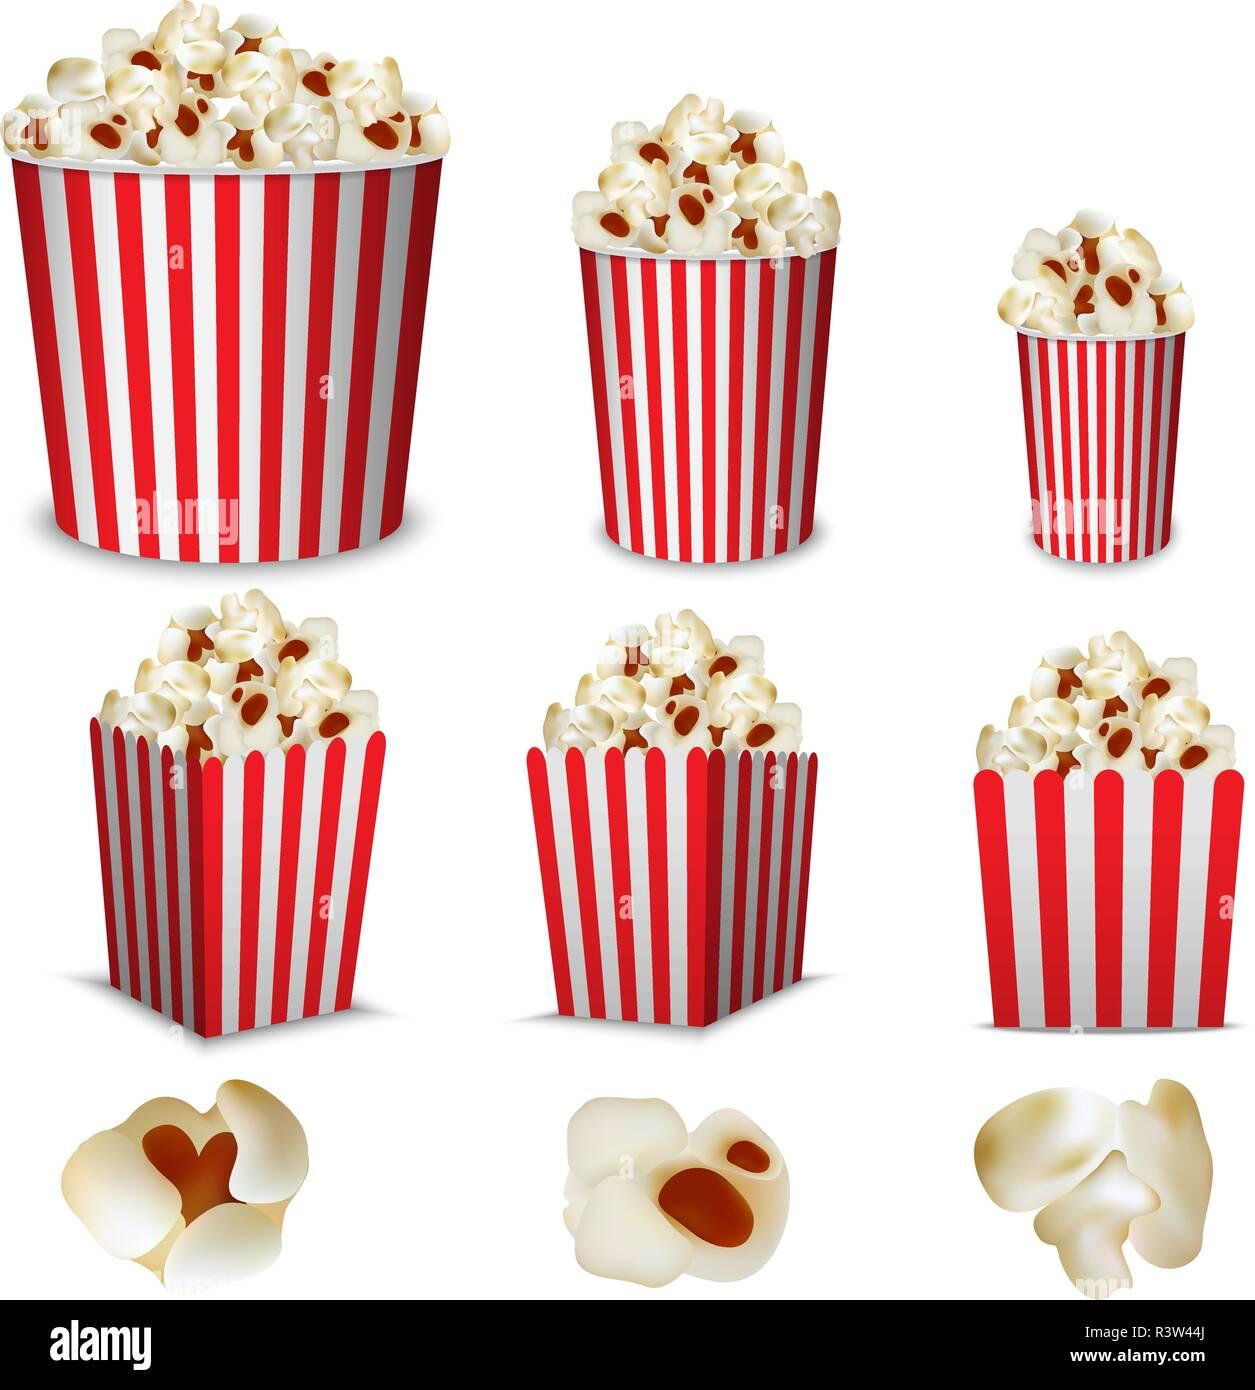 Popcorn cinema box striped mockup set. Realistic illustration of 9 popcorn cinema box striped mockups for web - Stock Image